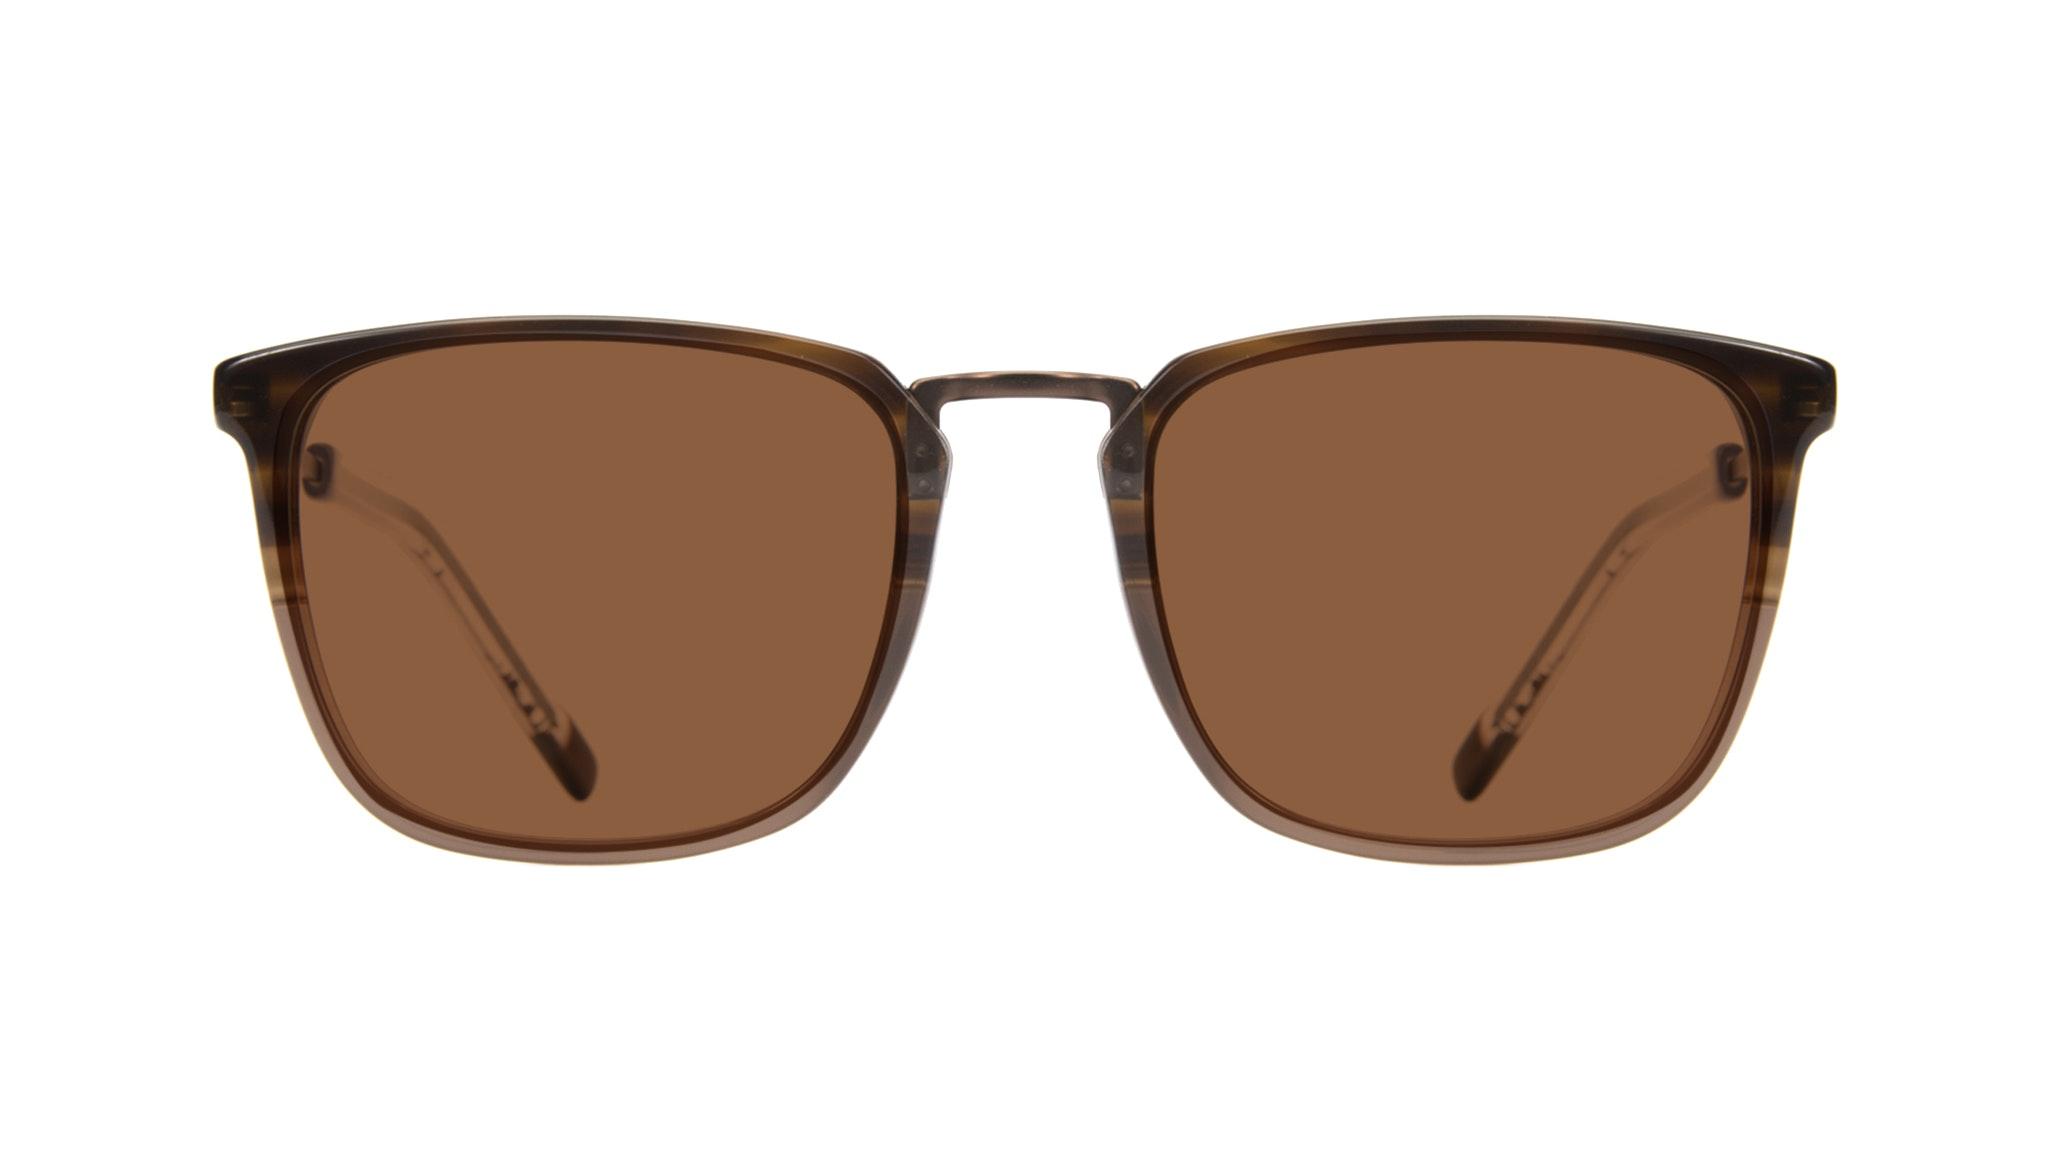 Affordable Fashion Glasses Rectangle Square Sunglasses Men Current Mud